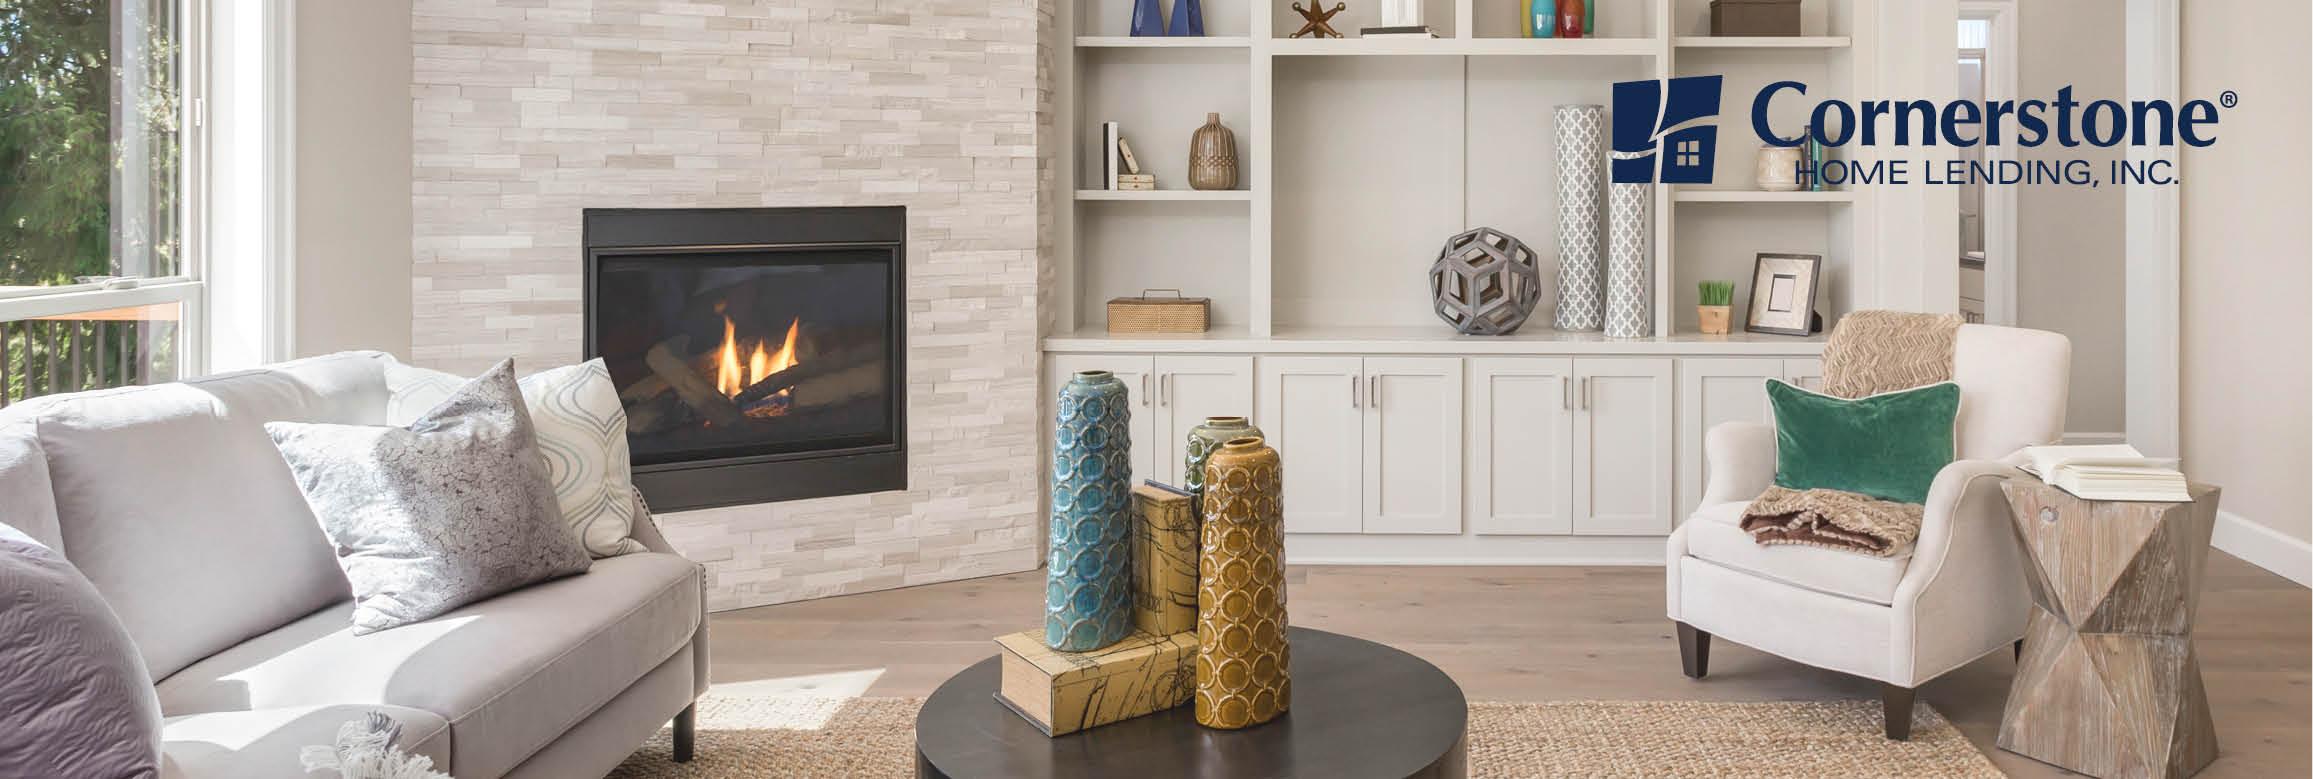 Cornerstone Home Lending, Inc. - Vaughn Willanger NMLS# 409989 reviews | Mortgage Lenders at 3055 112th Avenue NE - Bellevue WA